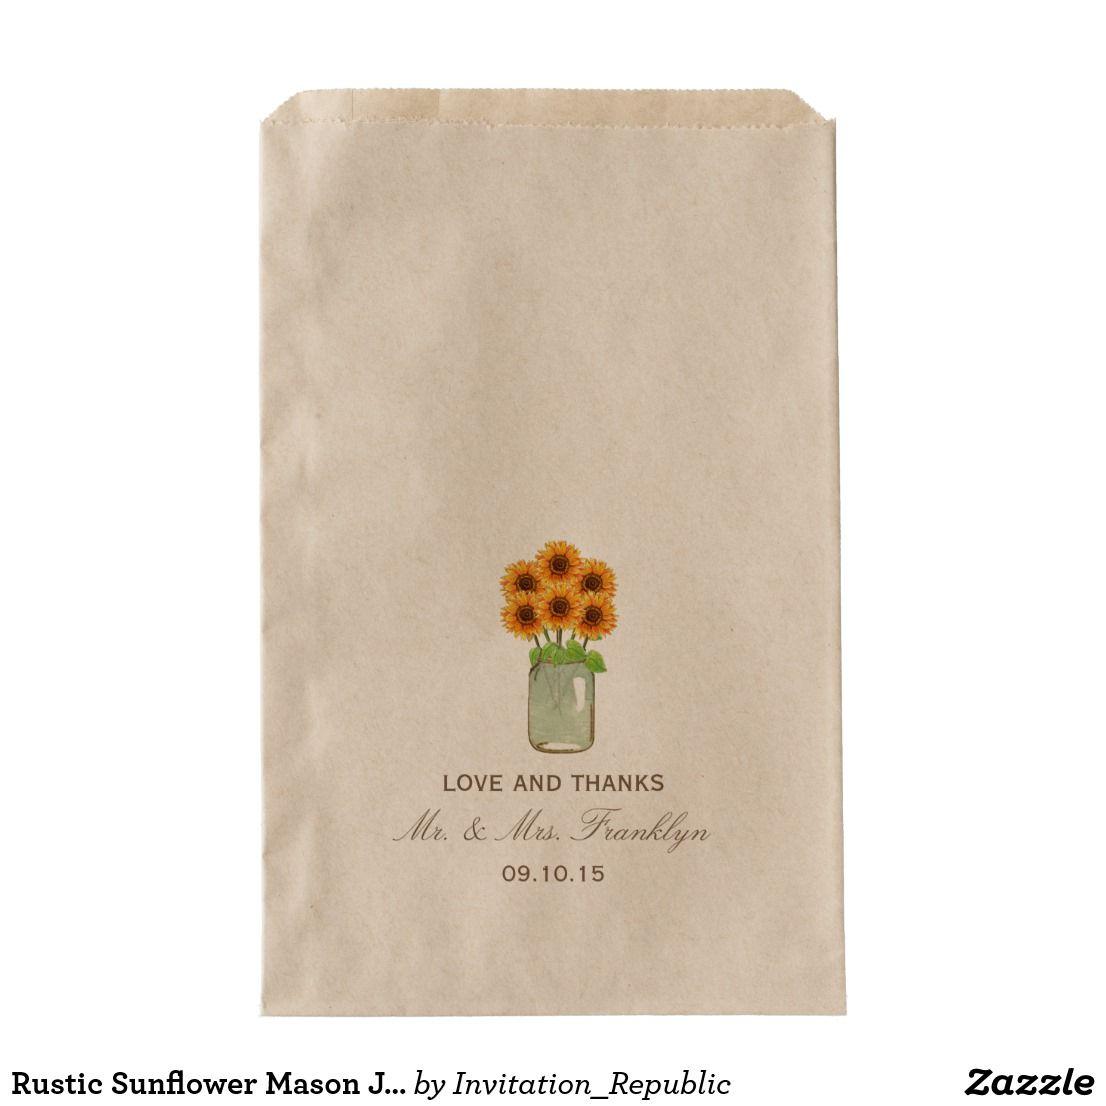 Rustic Sunflower Mason Jar Wedding Favor Bag | Wedding favor bags ...